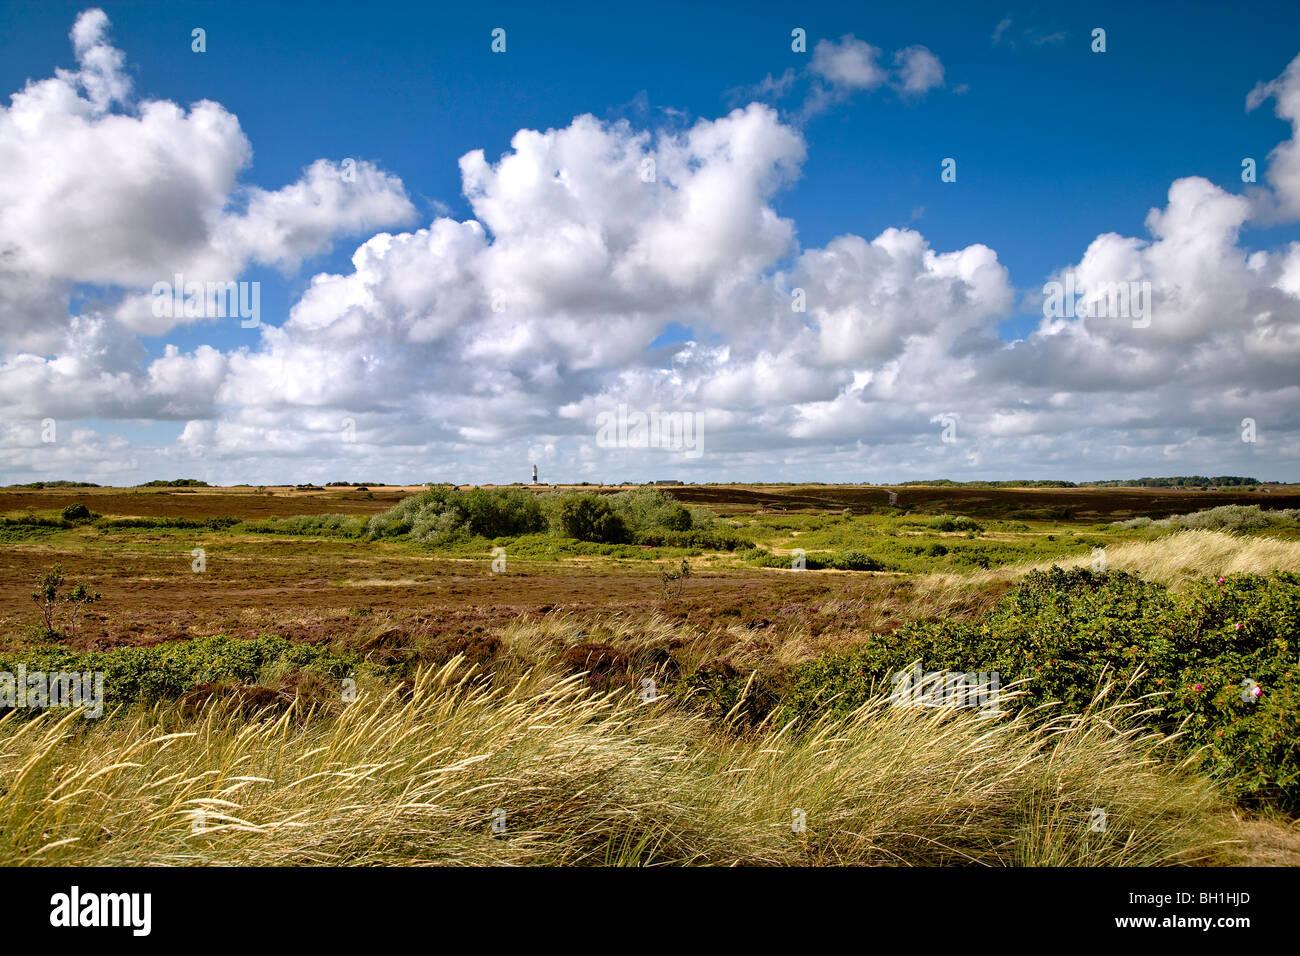 Braderup heath, Braderup, Sylt Island, Schleswig-Holstein, Germany - Stock Image